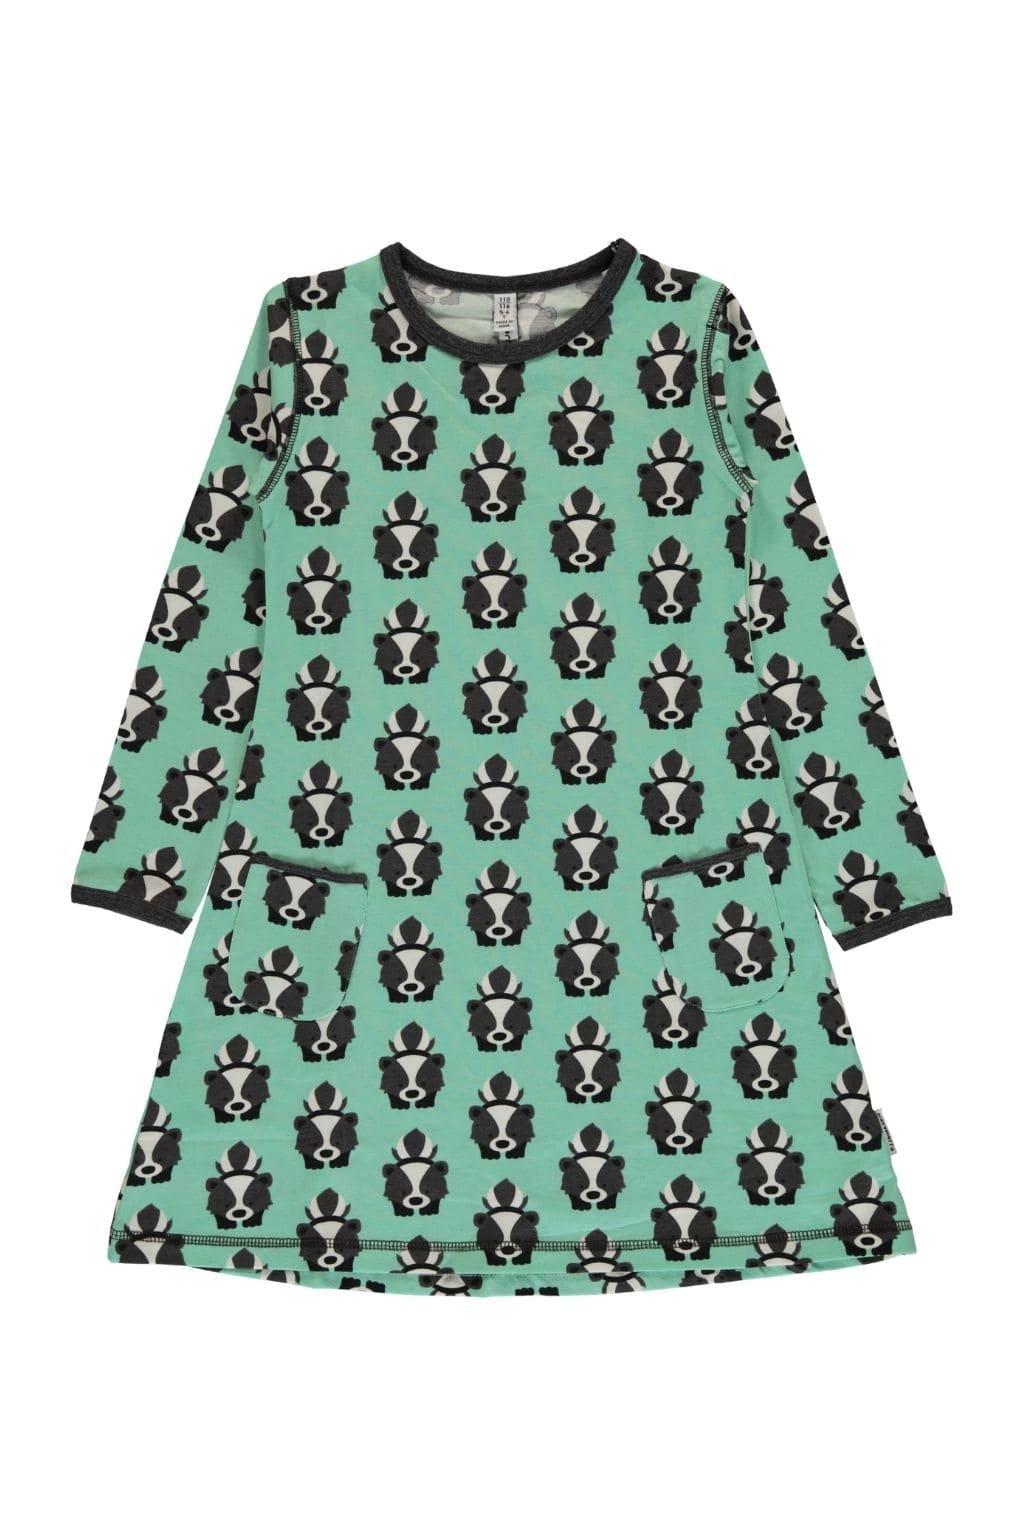 dress ls skunk (1)